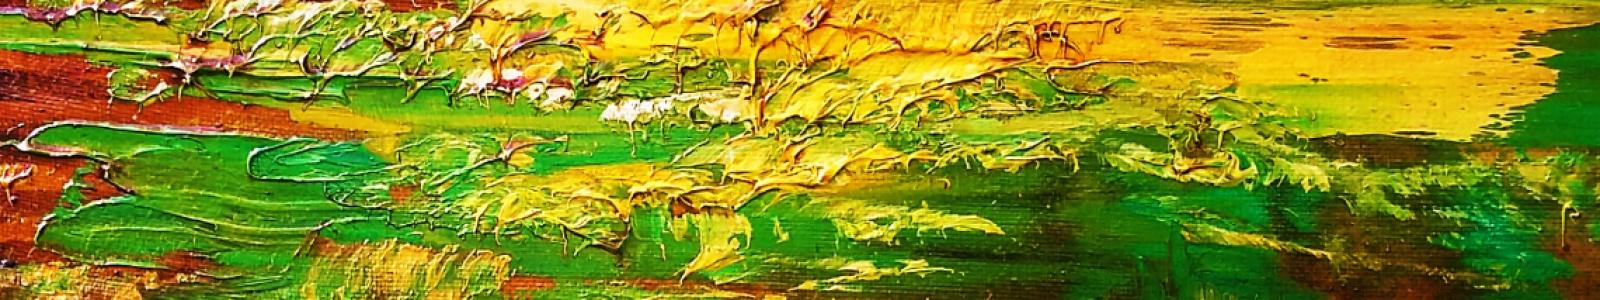 Gallery Painter Asya Zhukova